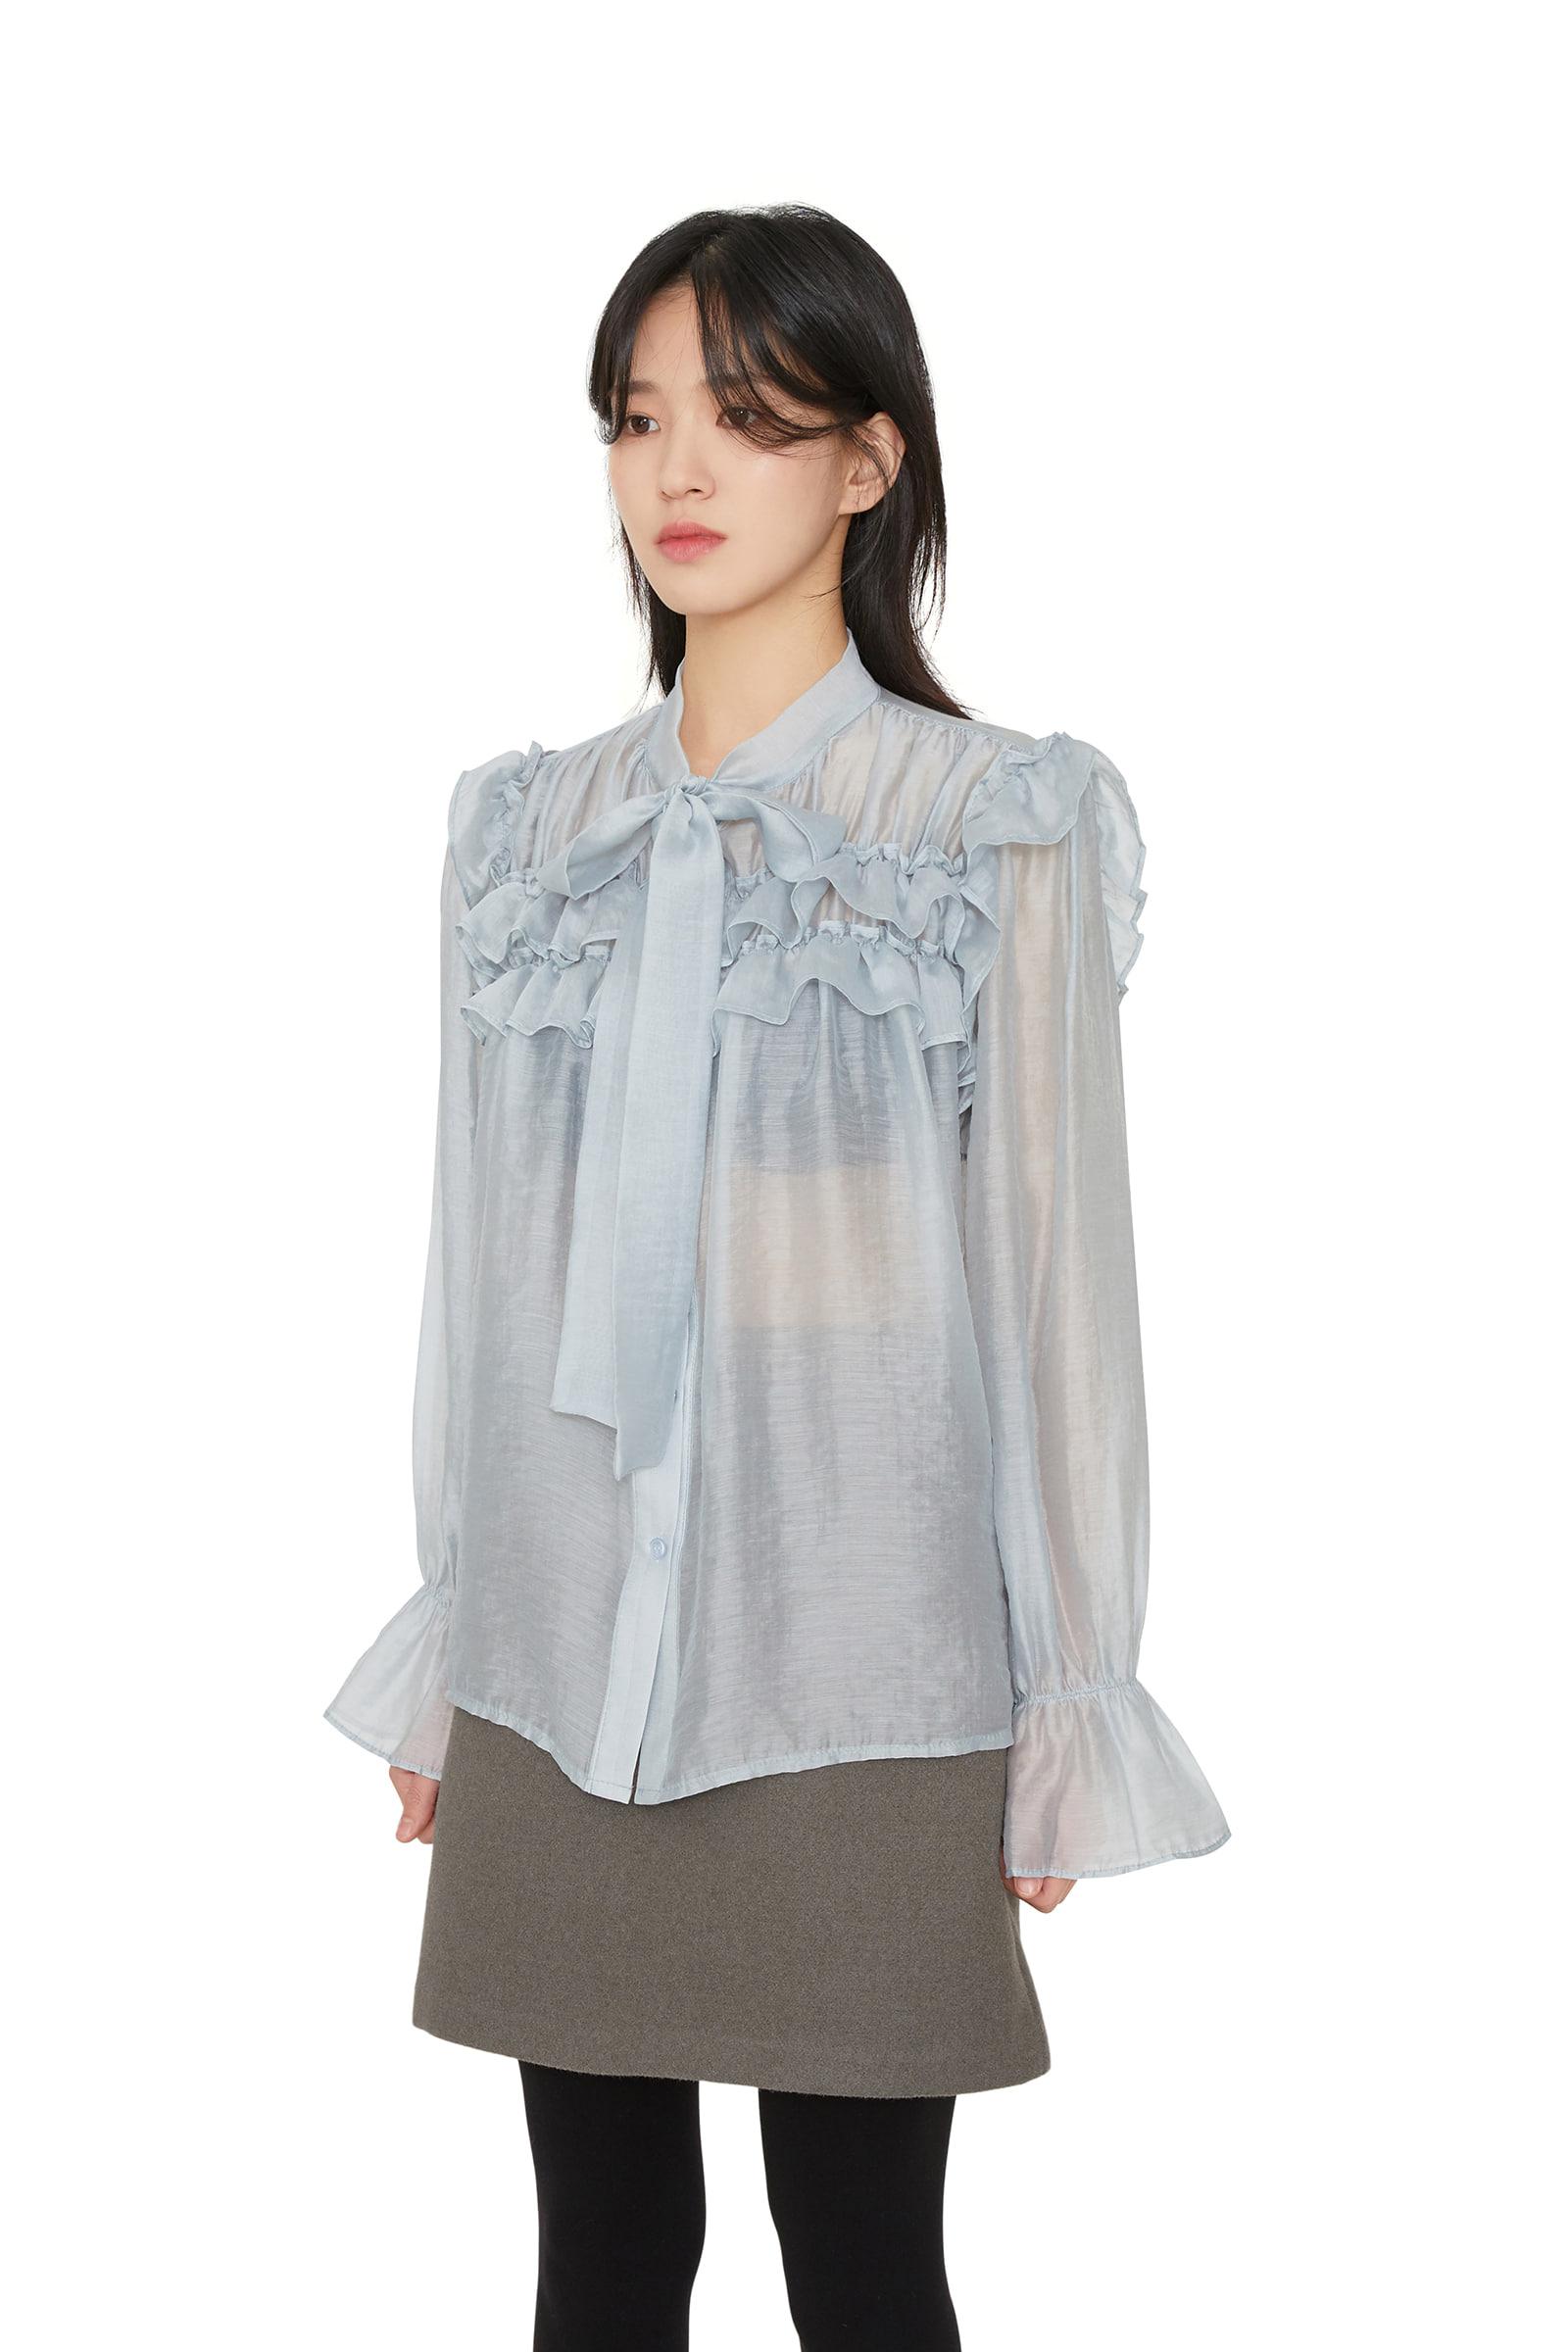 Sorbet sheer ribbon blouse